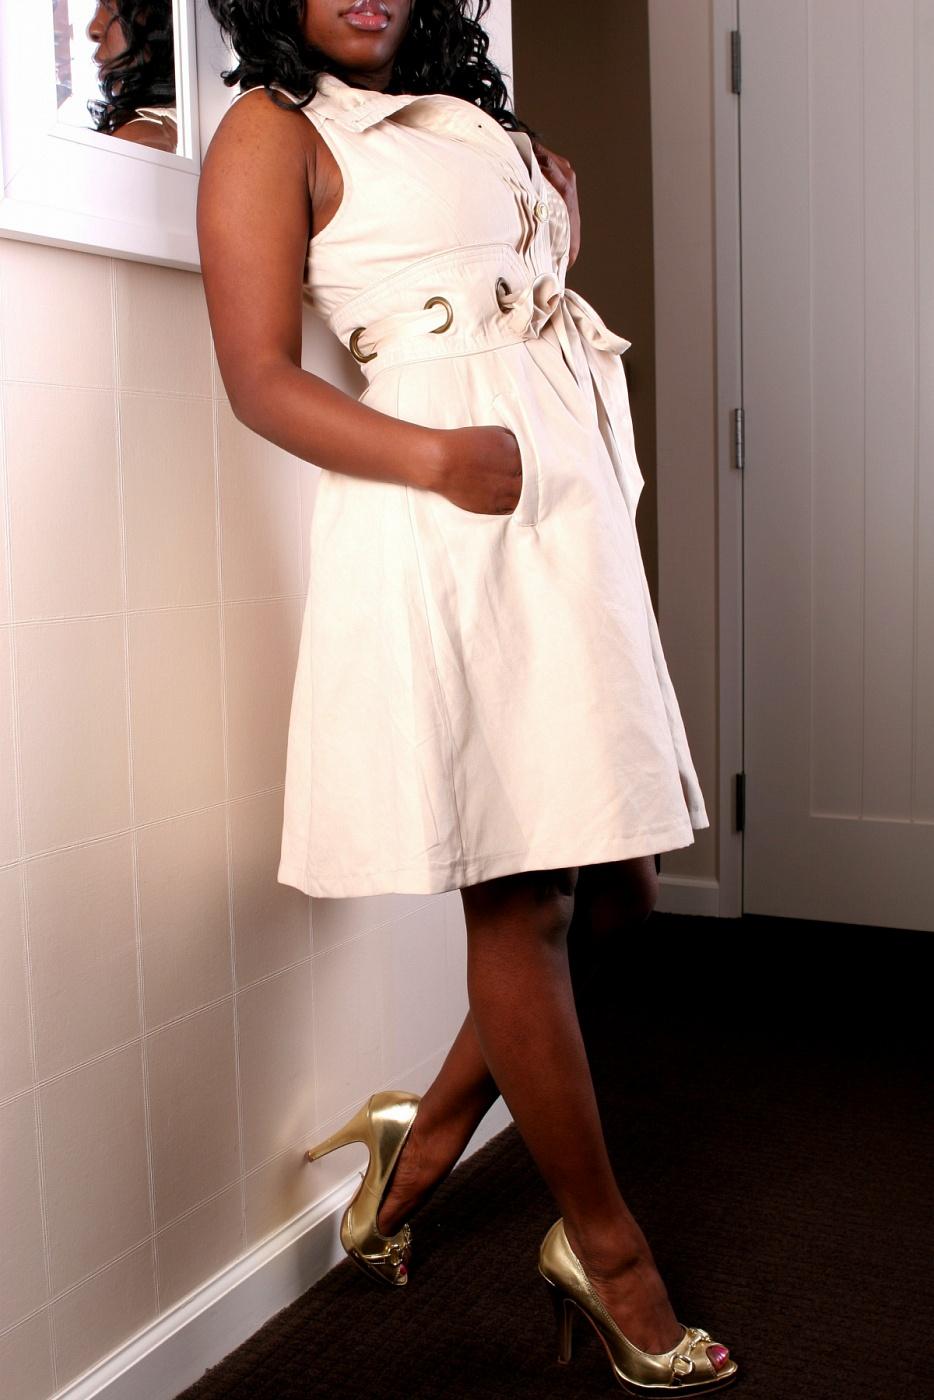 Aasha Mitchell